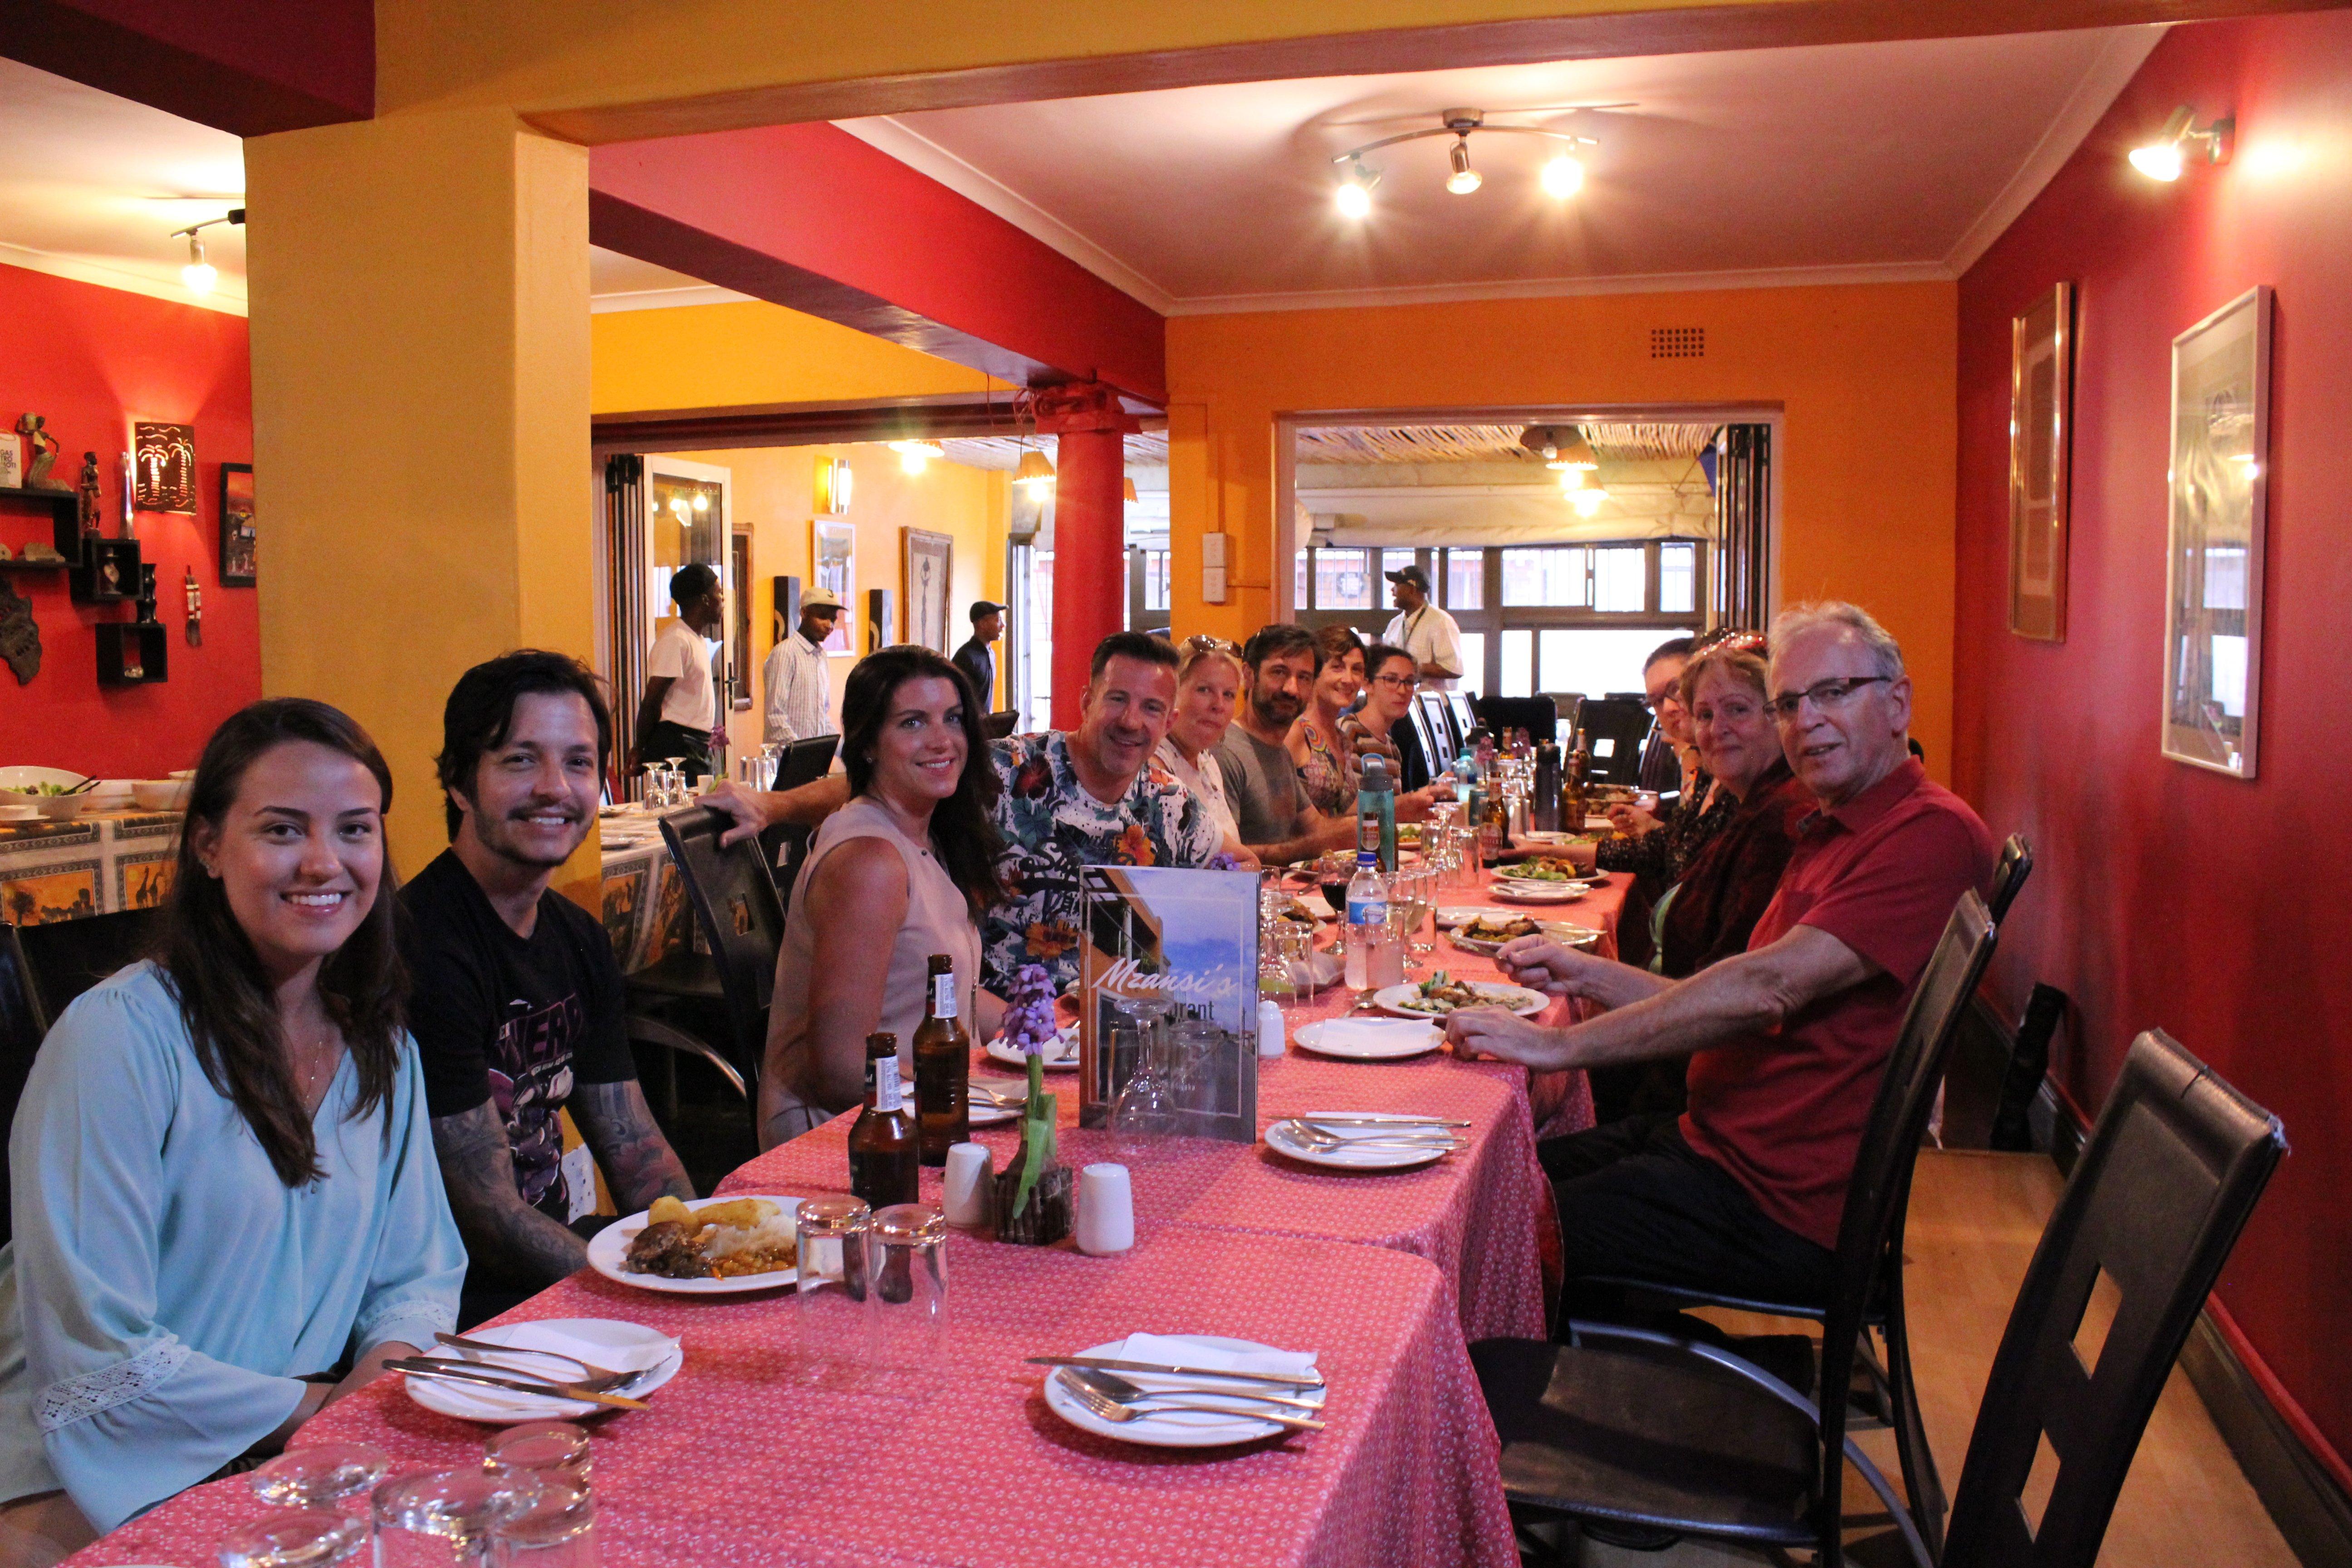 Things To Do in Tunisian, Restaurants in Tunisian